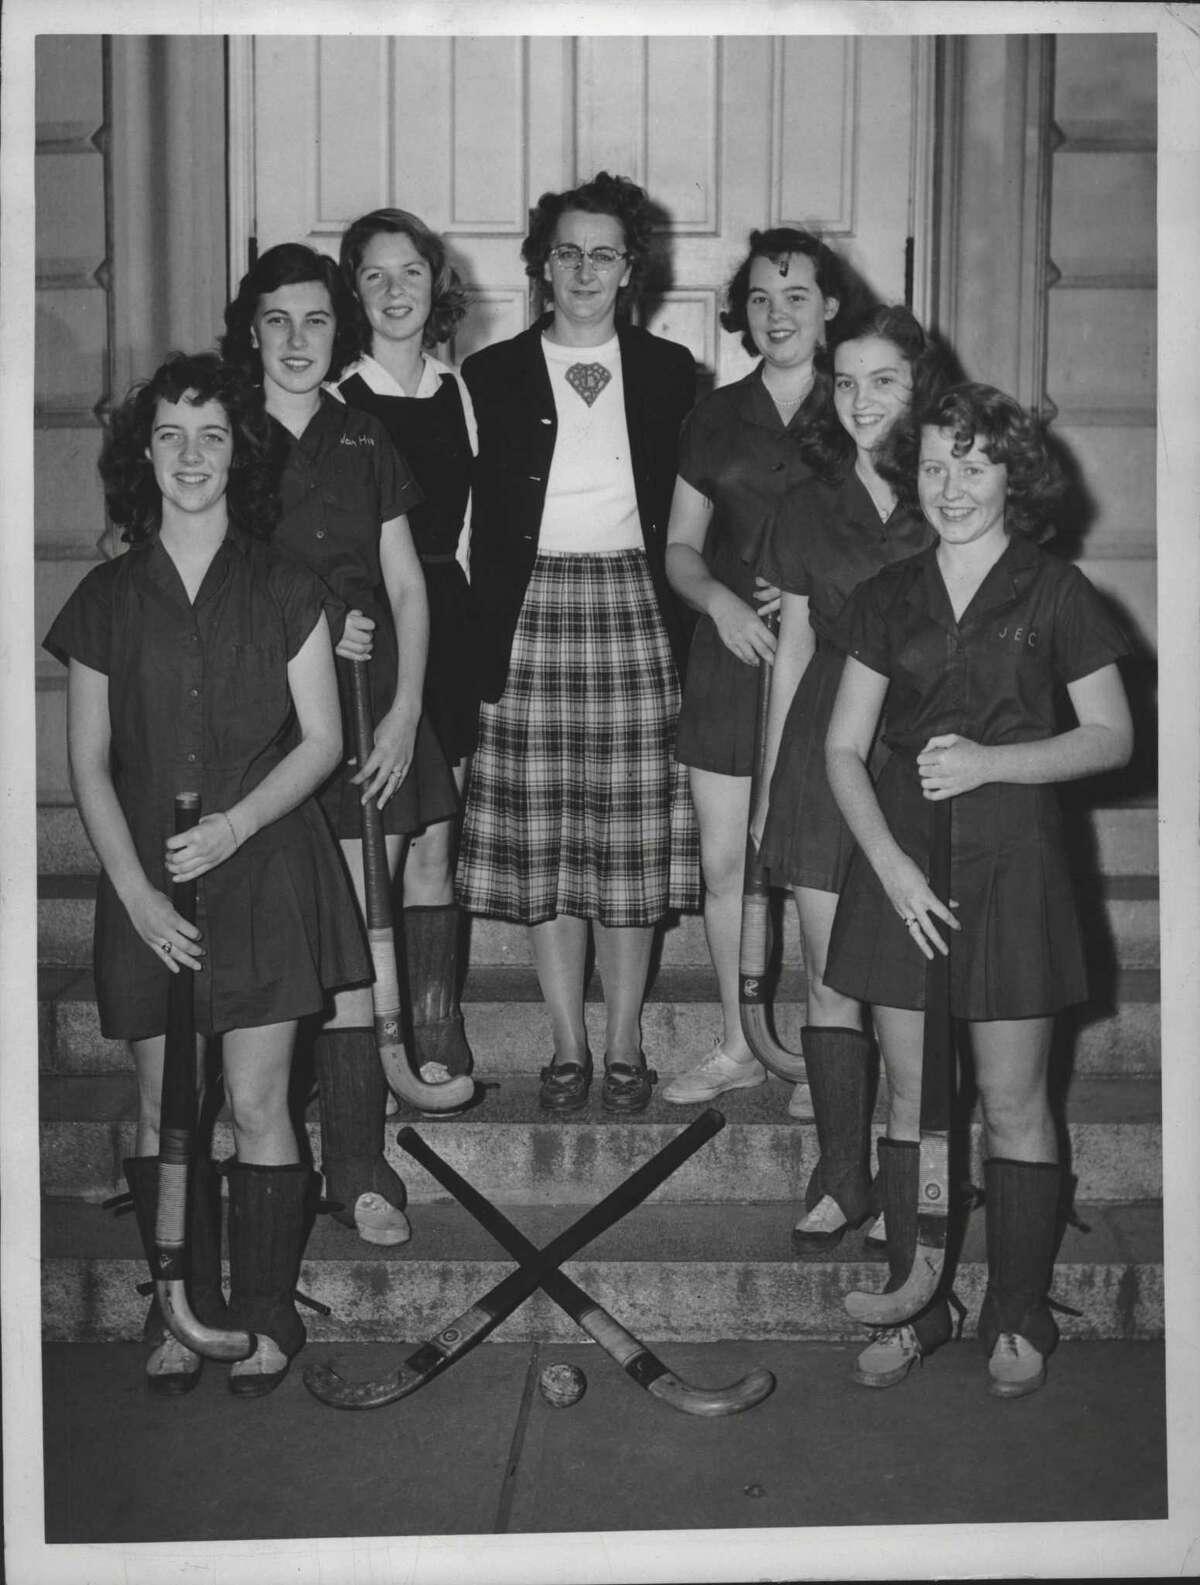 Milne High School field hockey team & coach, Albany, New York - Beverly Orrett, Janet Hicks, Barbara Leete, Lydia Murray - Coach, Helen Bigley, Helen Cupp, and Joan Clark. May 17, 1949 (Times Union Archive)